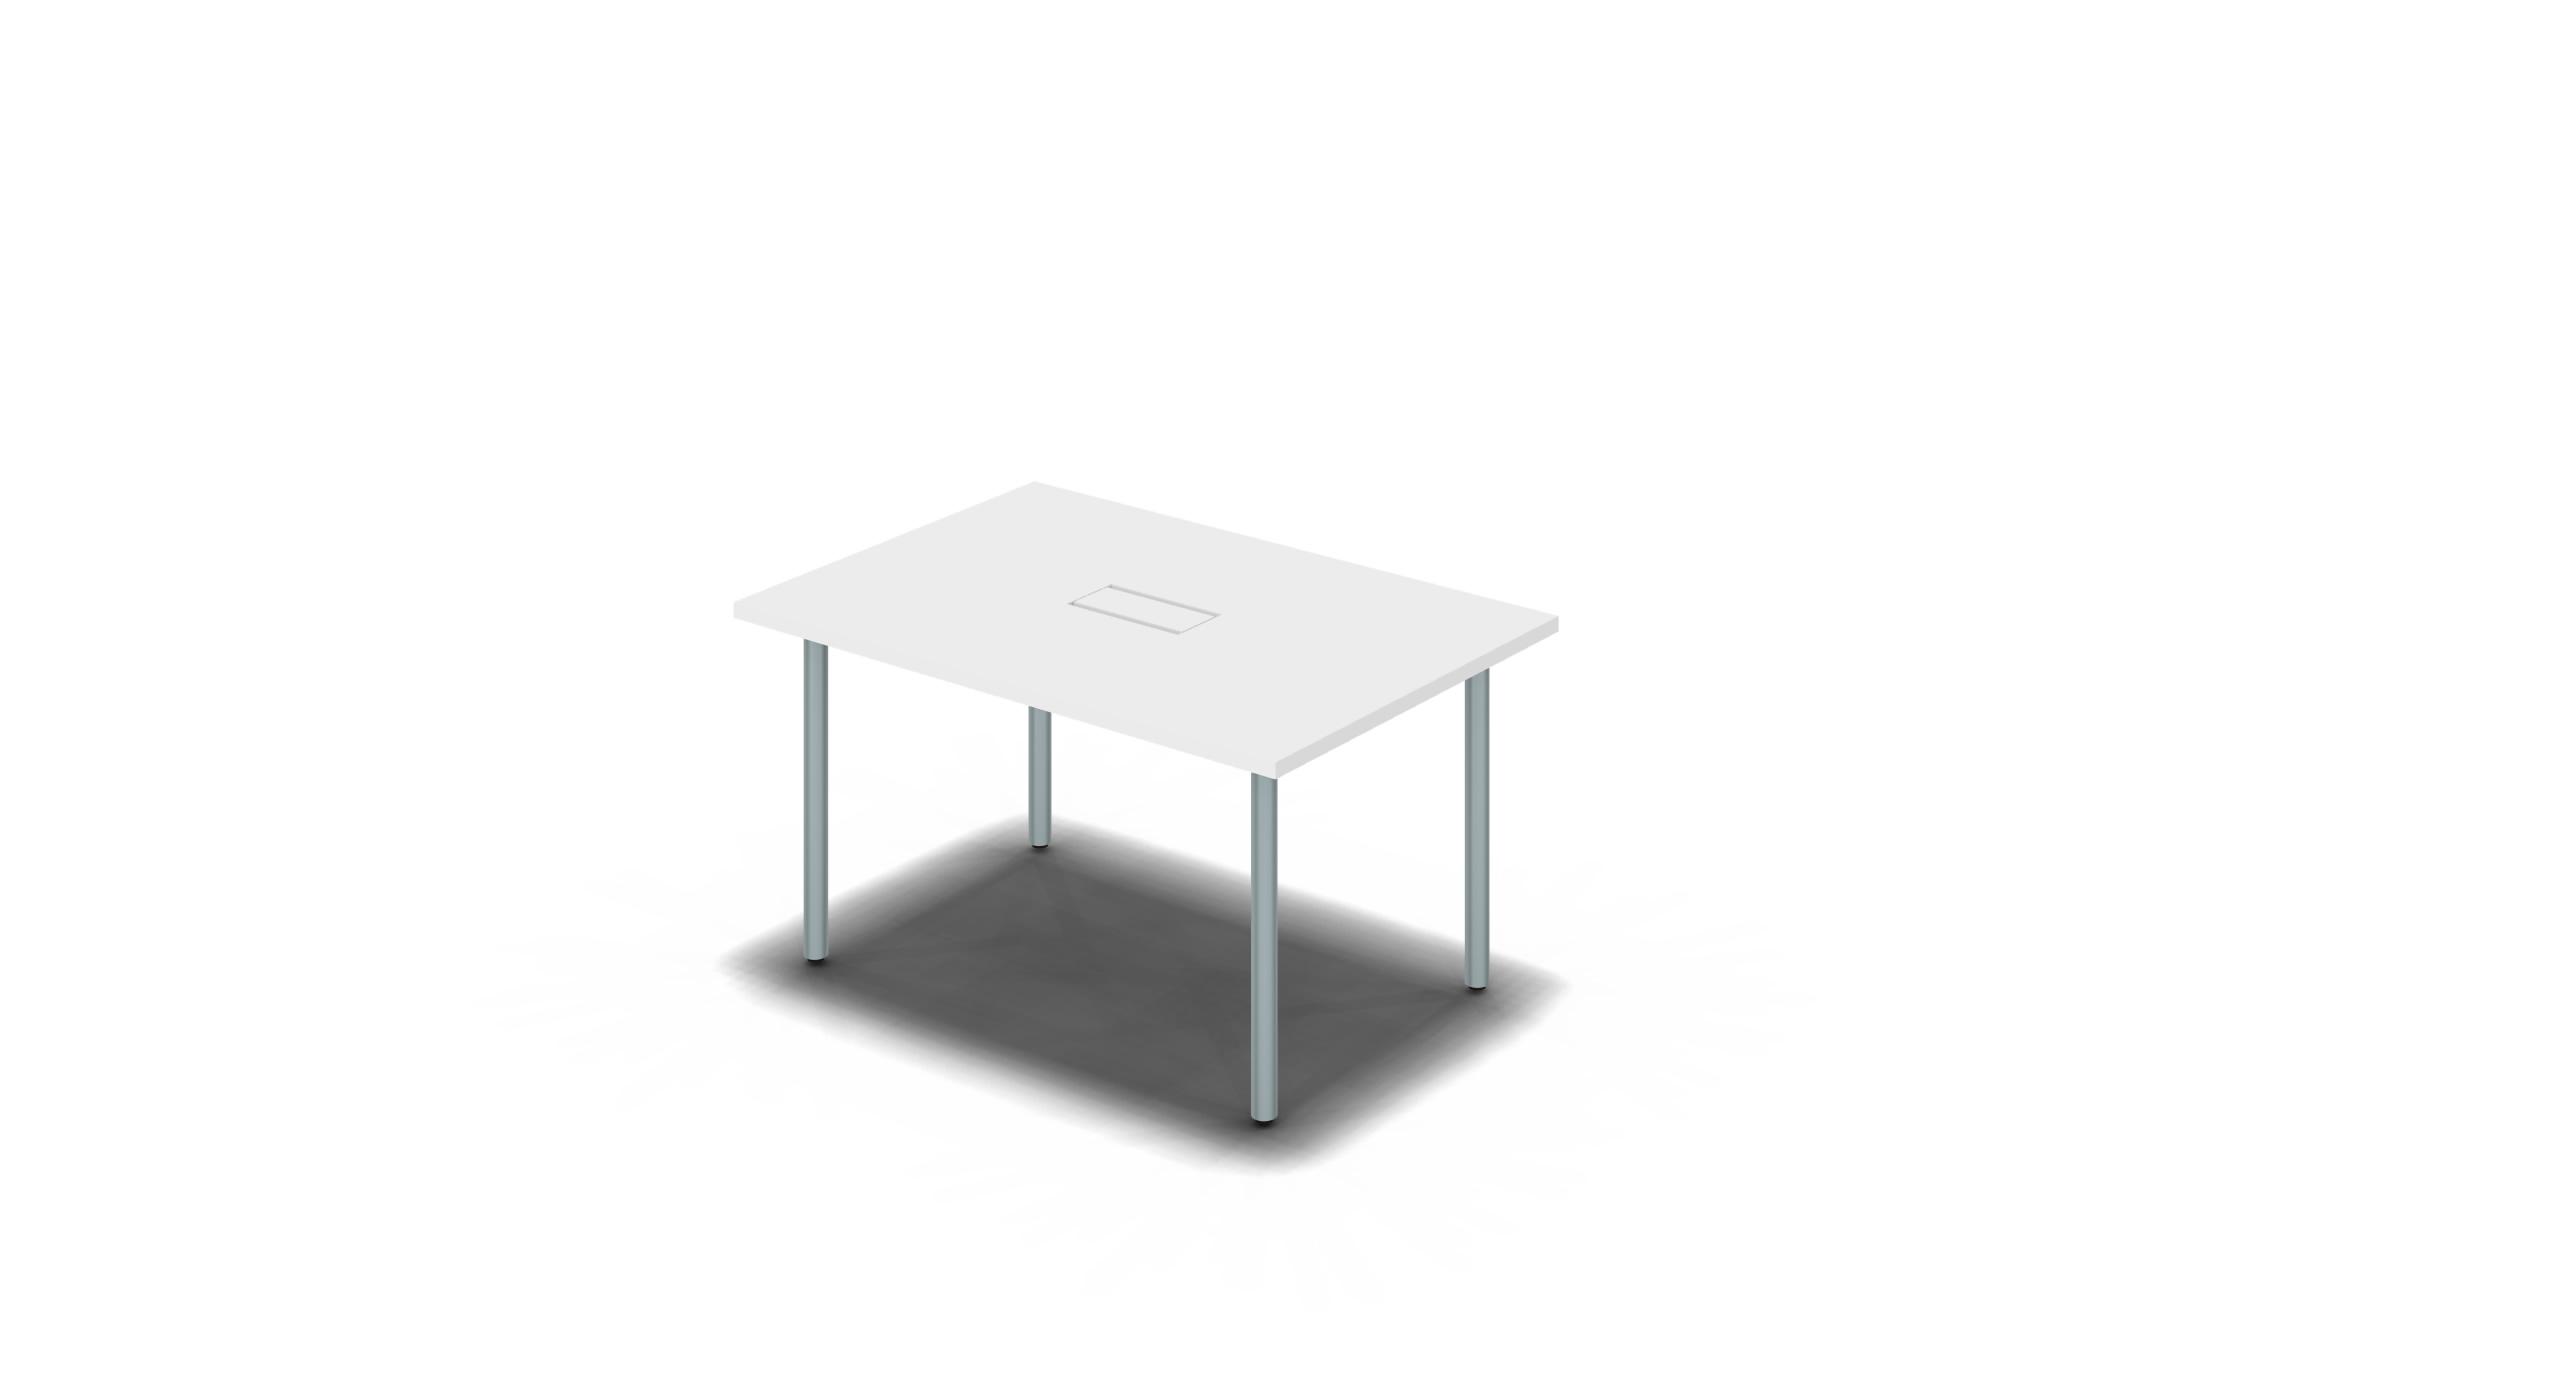 Table_Round_1200x800_Silver_White_withOption